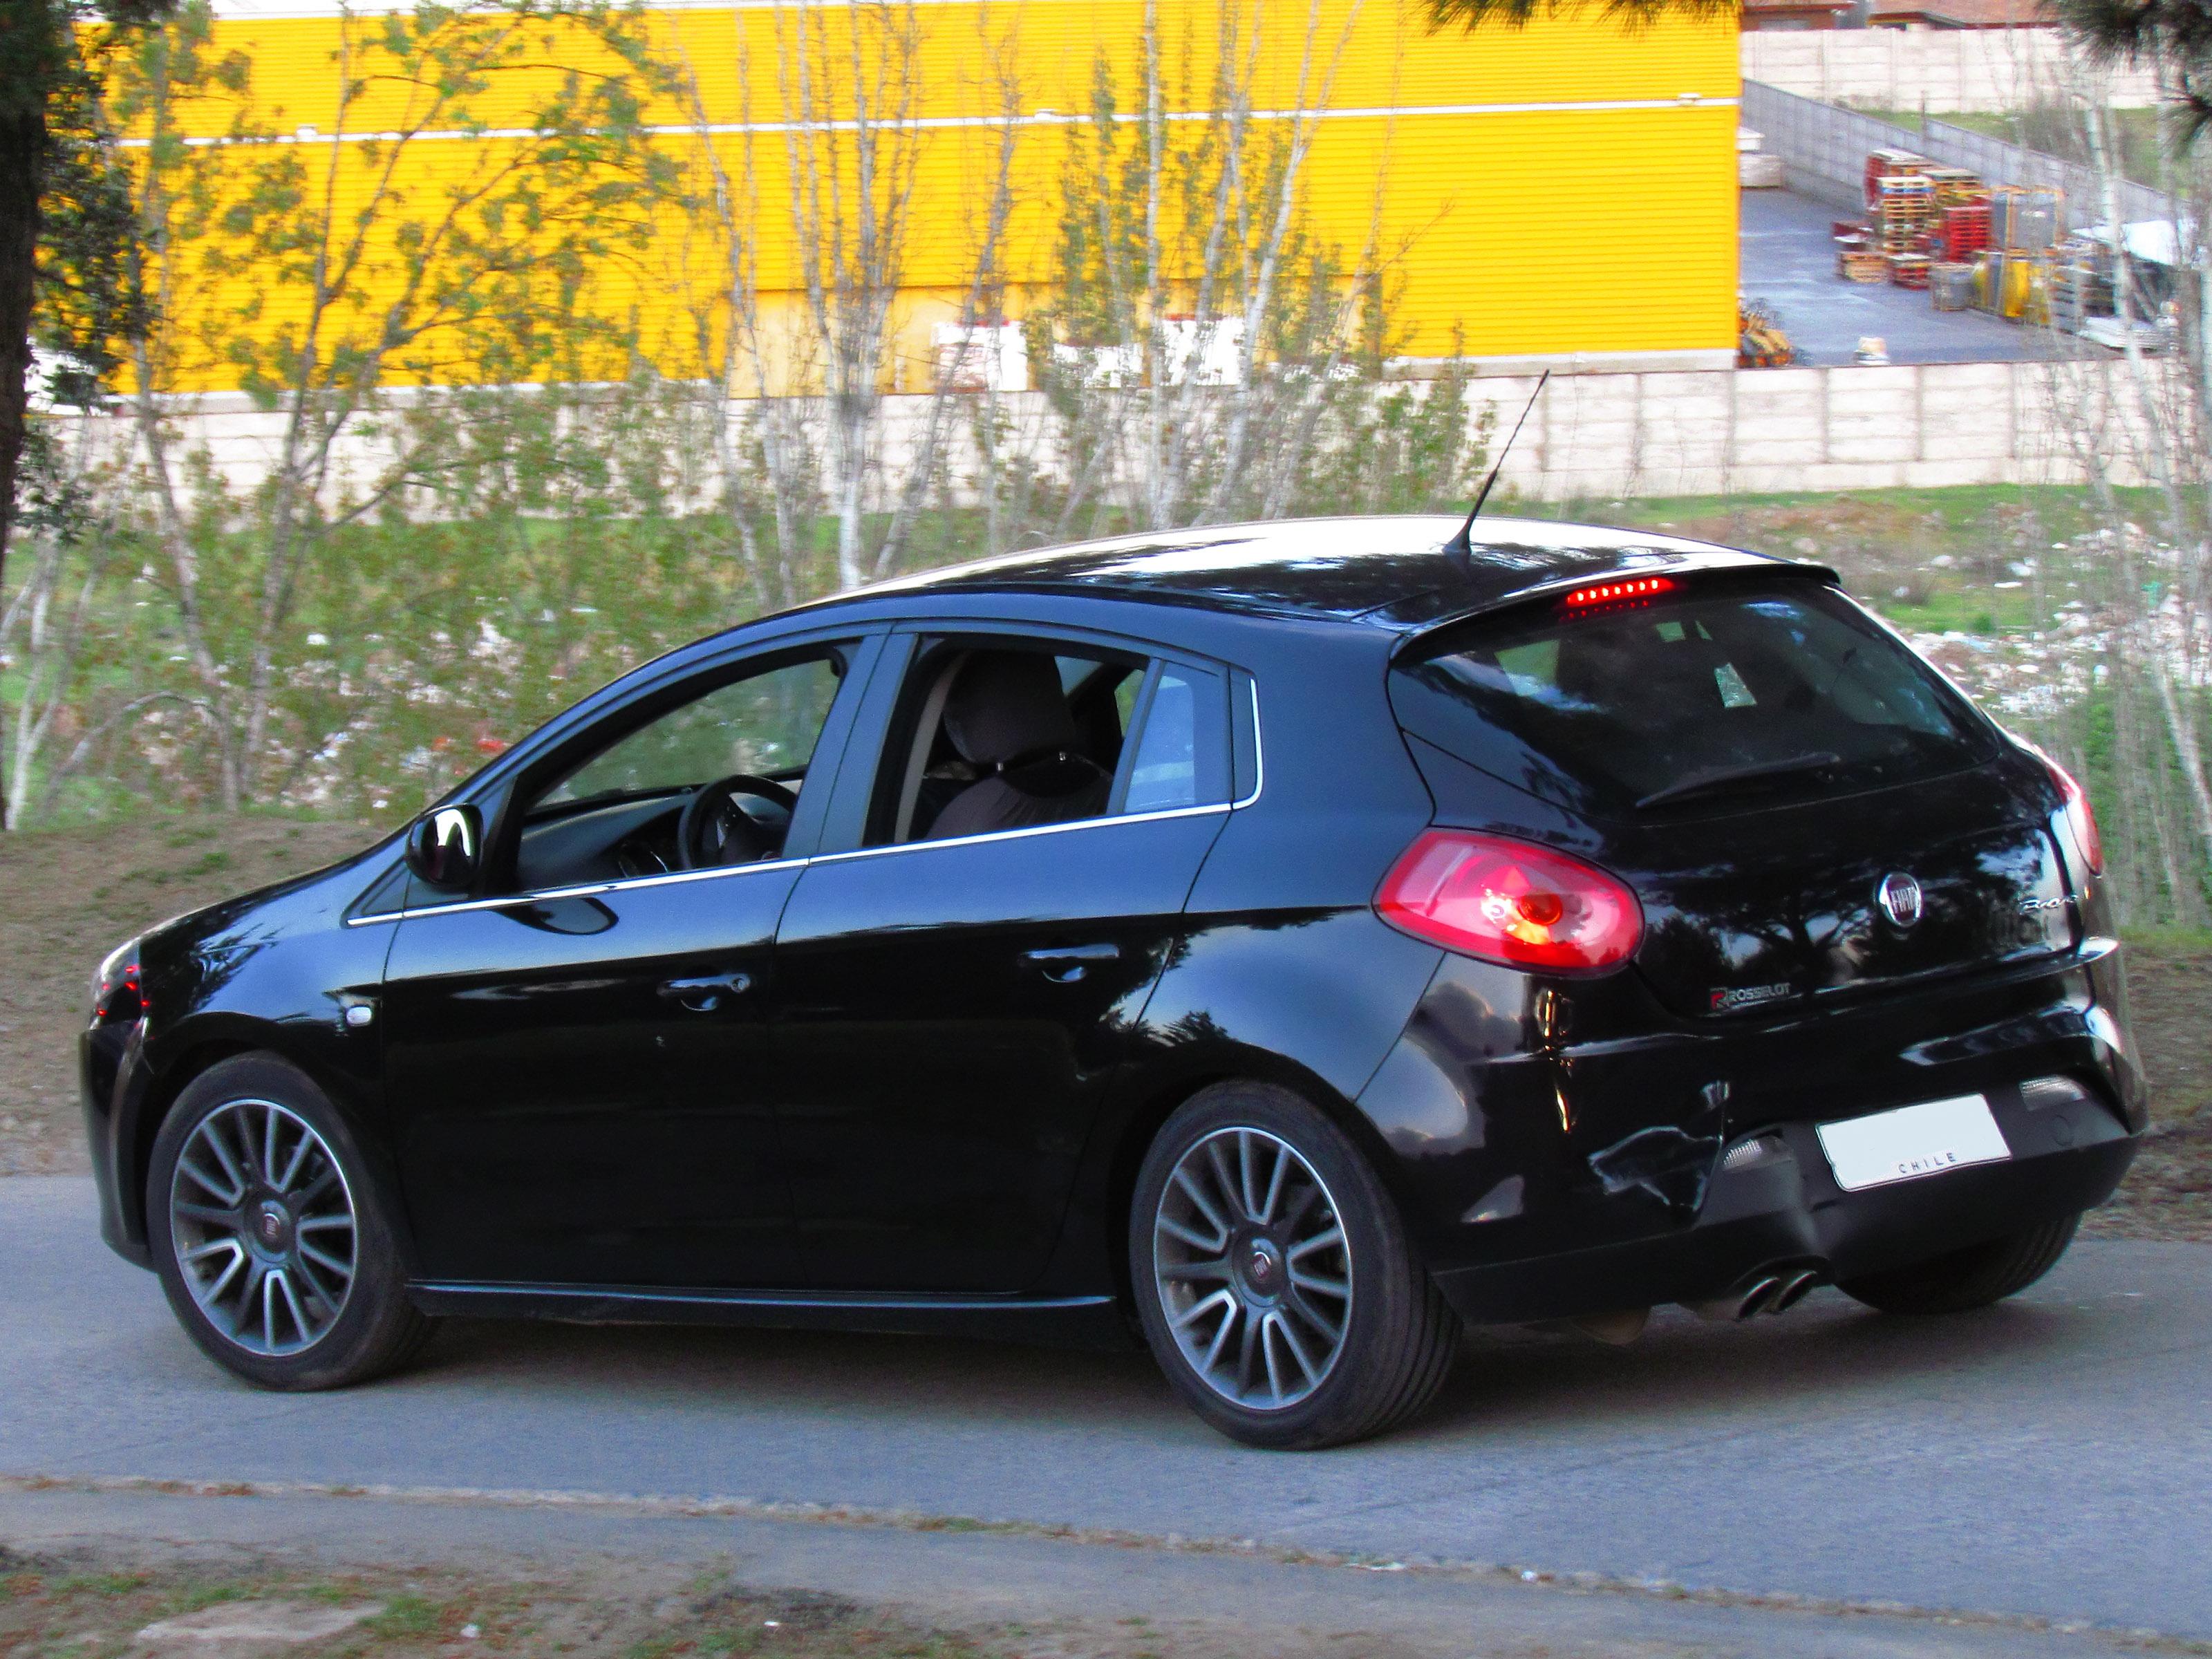 File Fiat Bravo 1 4 Sport 2012 14461798905 Jpg